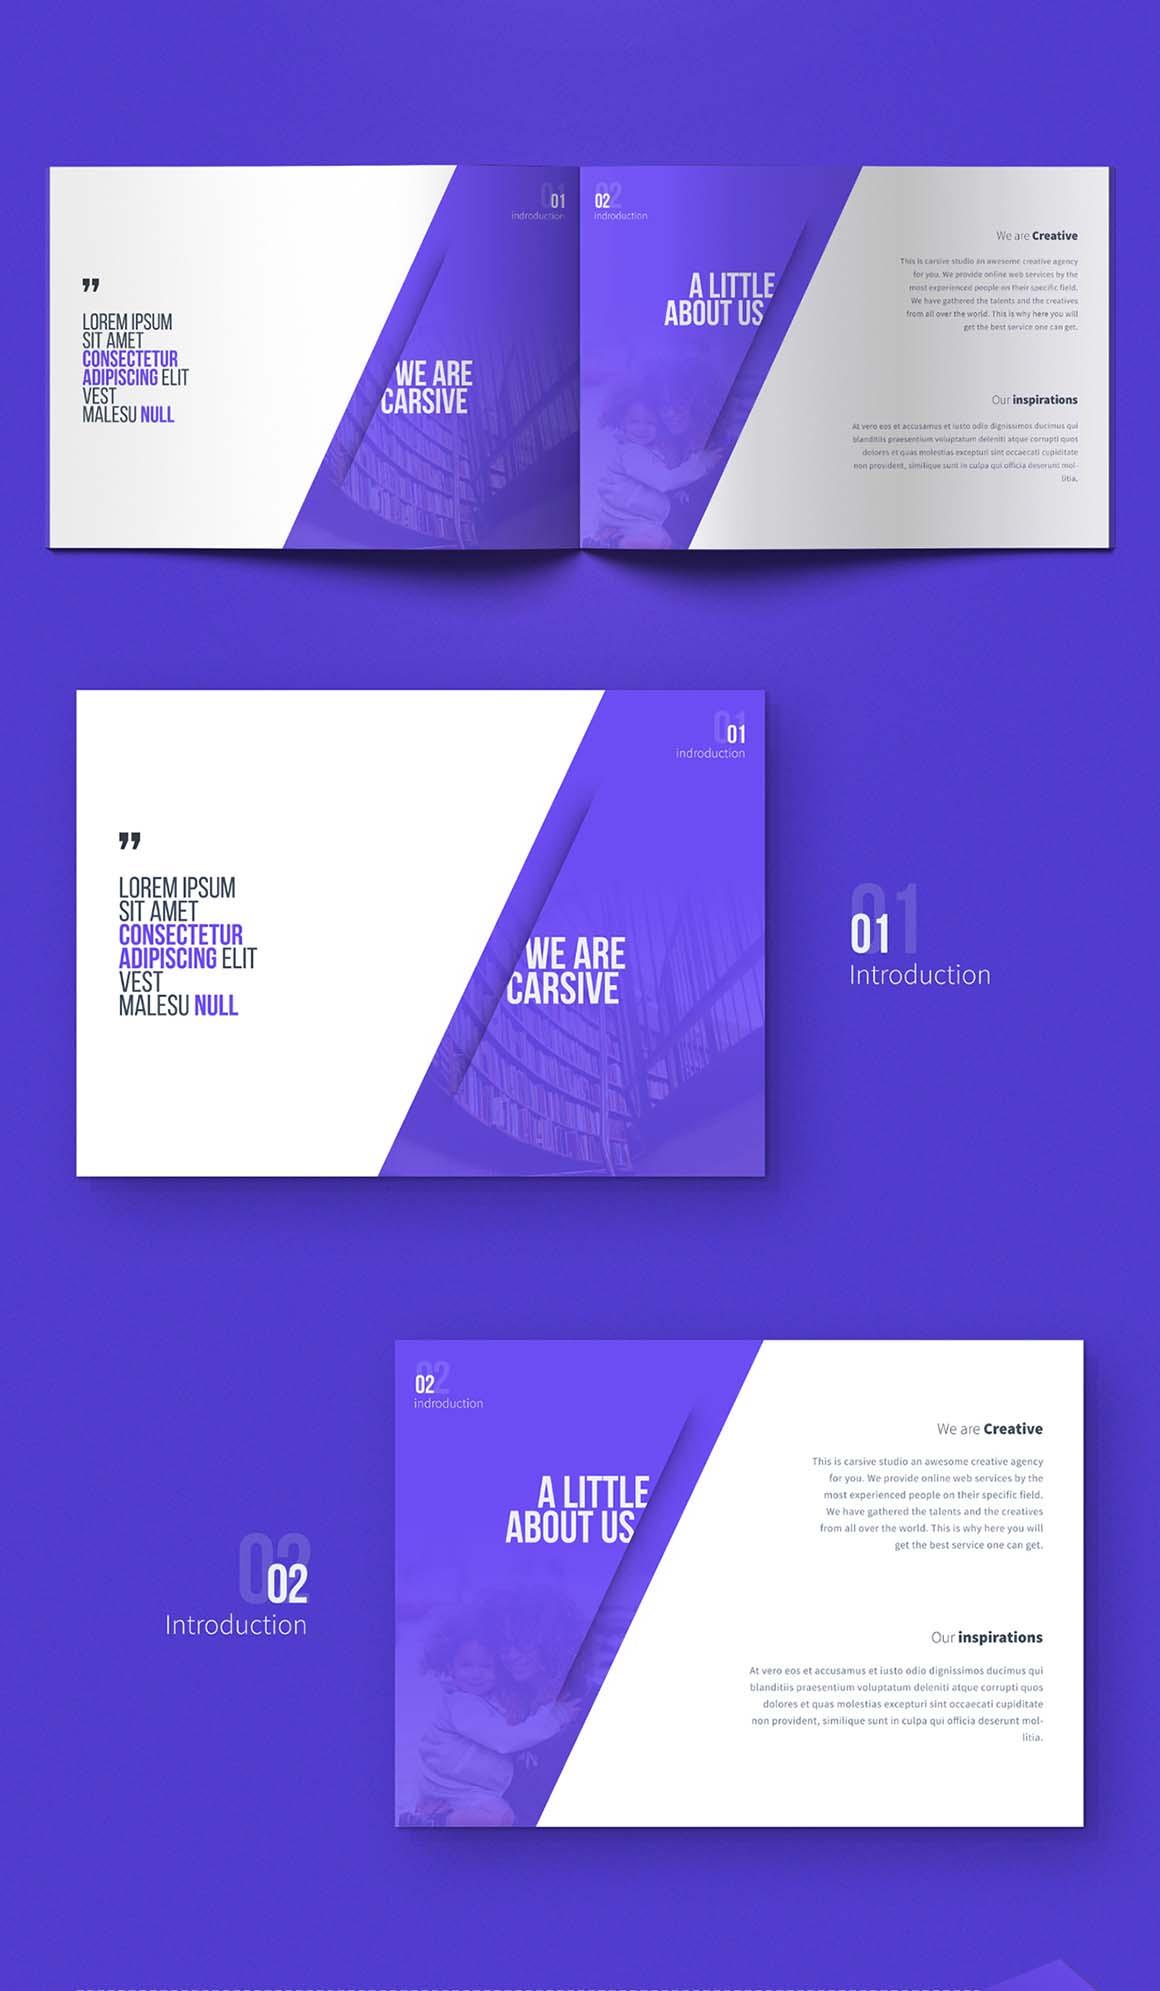 Free PSD Brochure Template - Dealjumbo.com — Discounted design ...